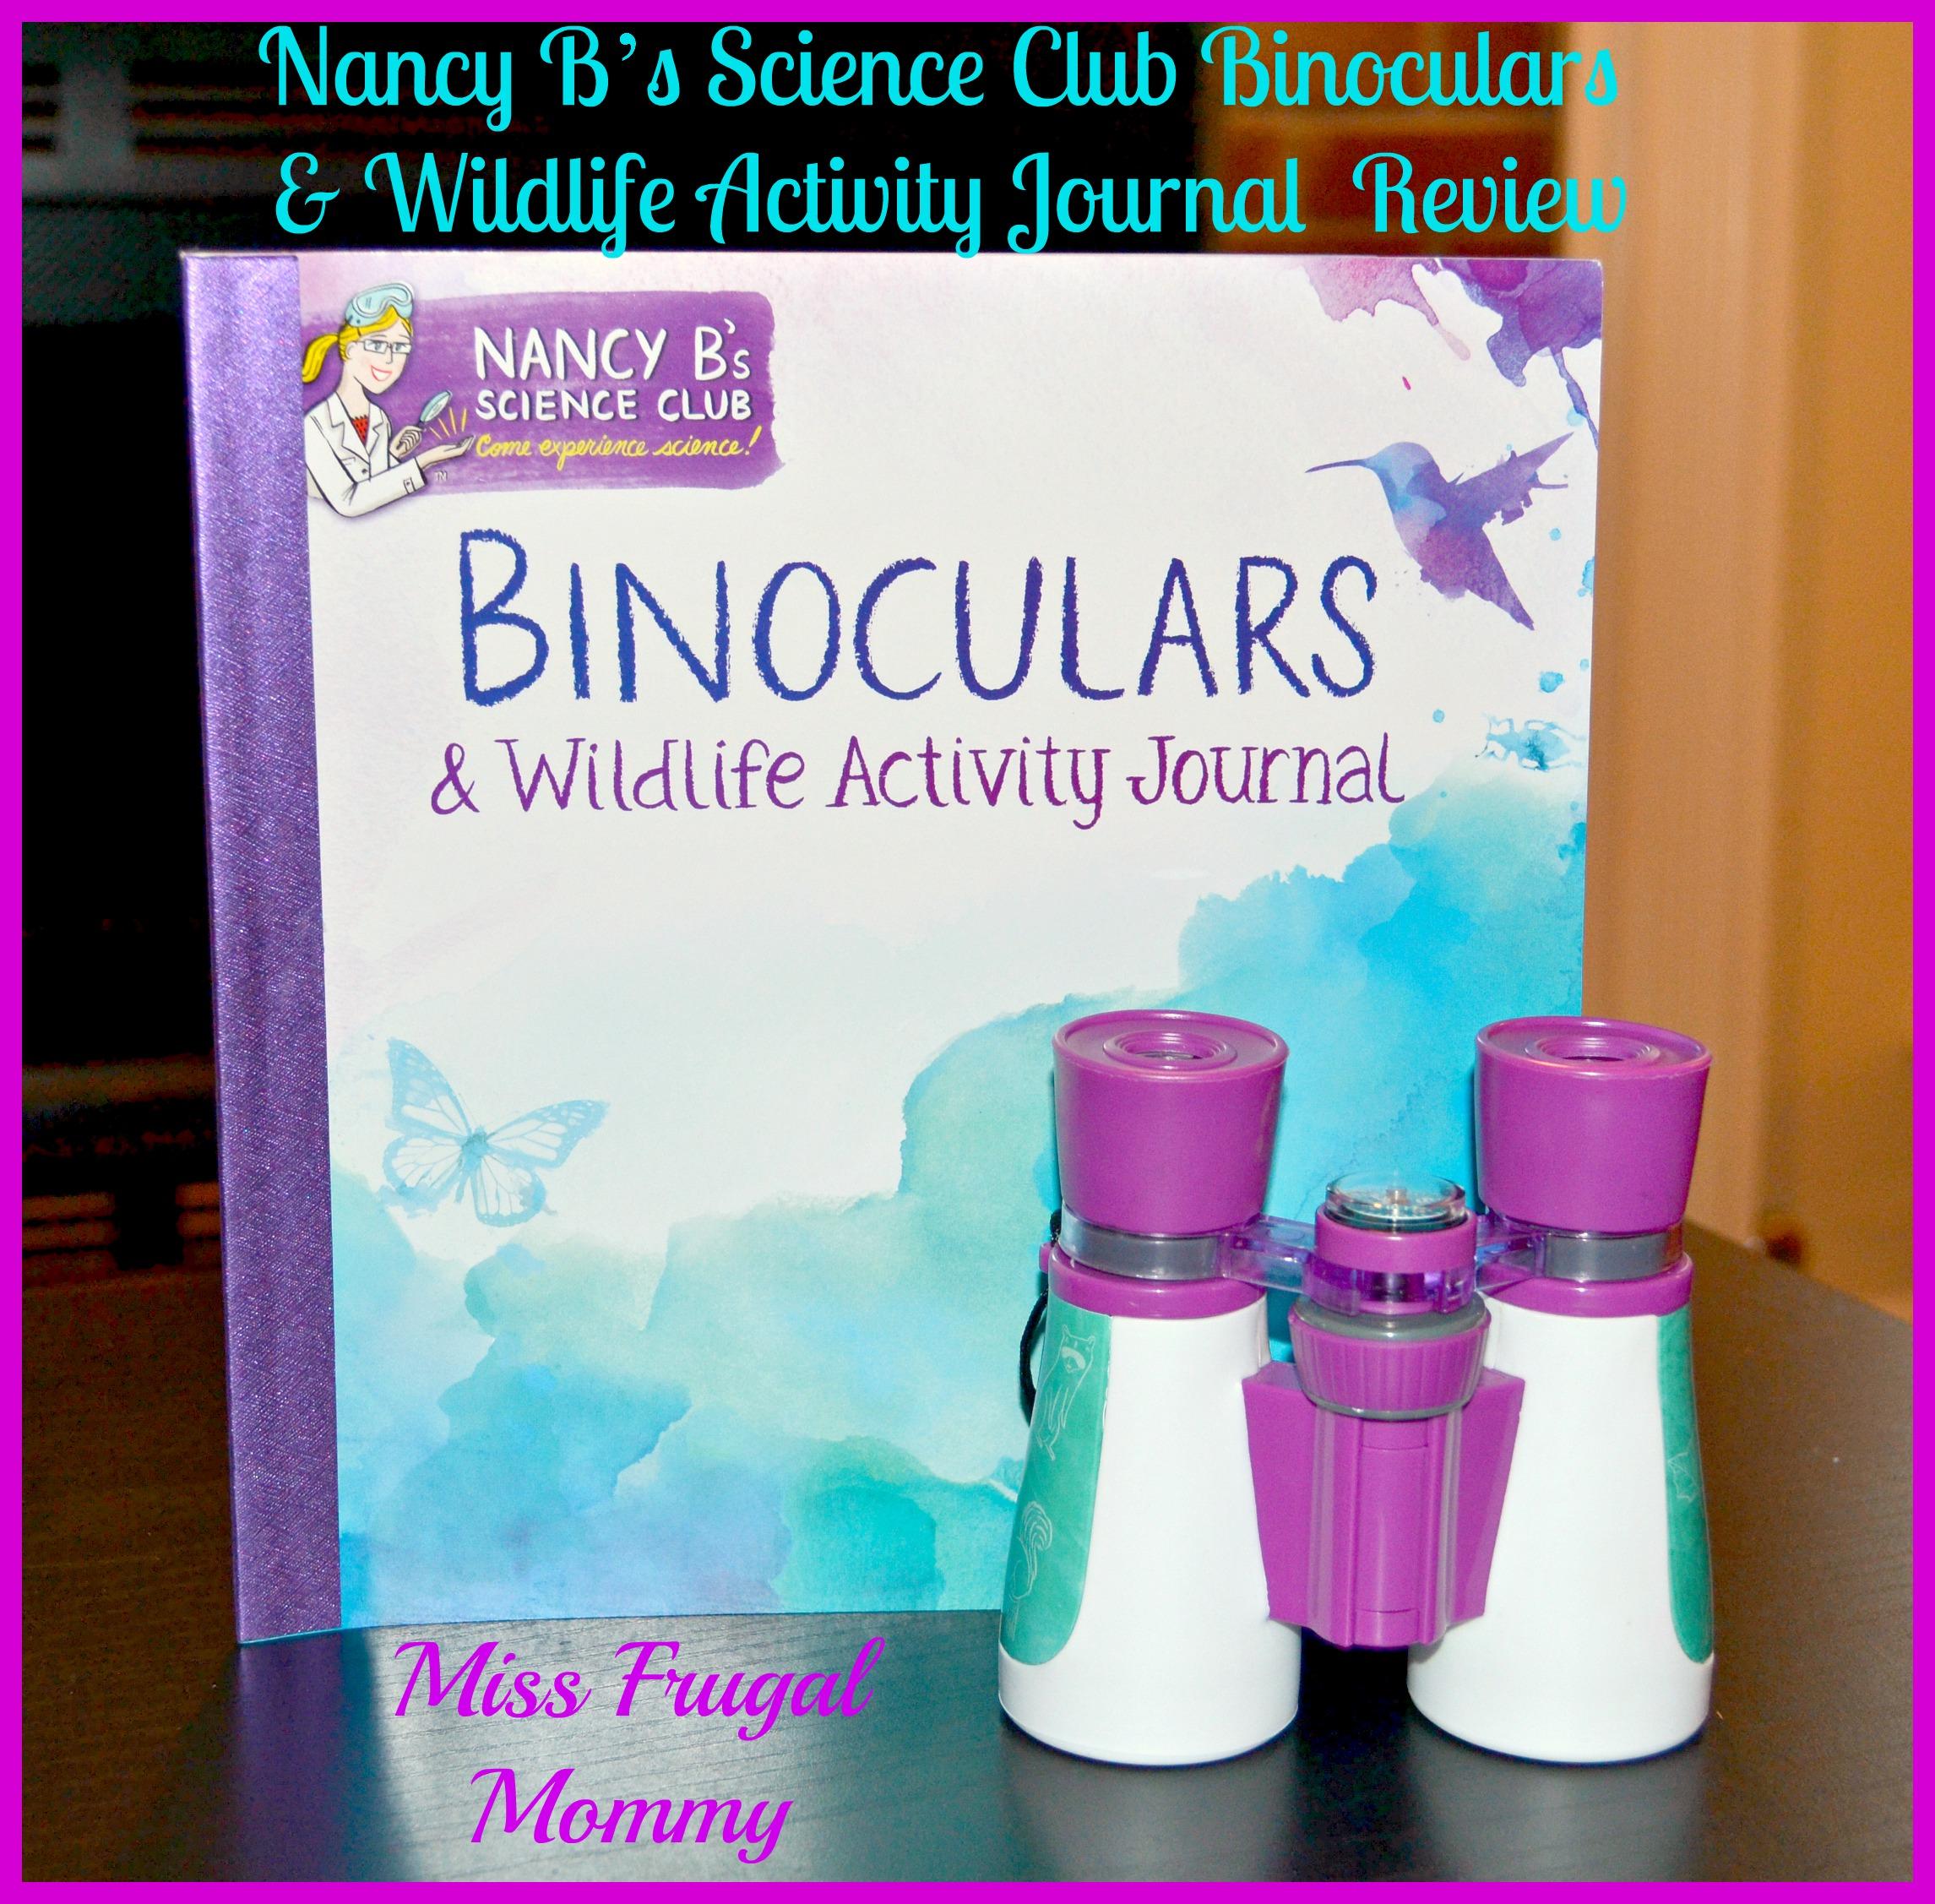 Nancy B's Science Club Binoculars & Wildlife Activity Journal Review